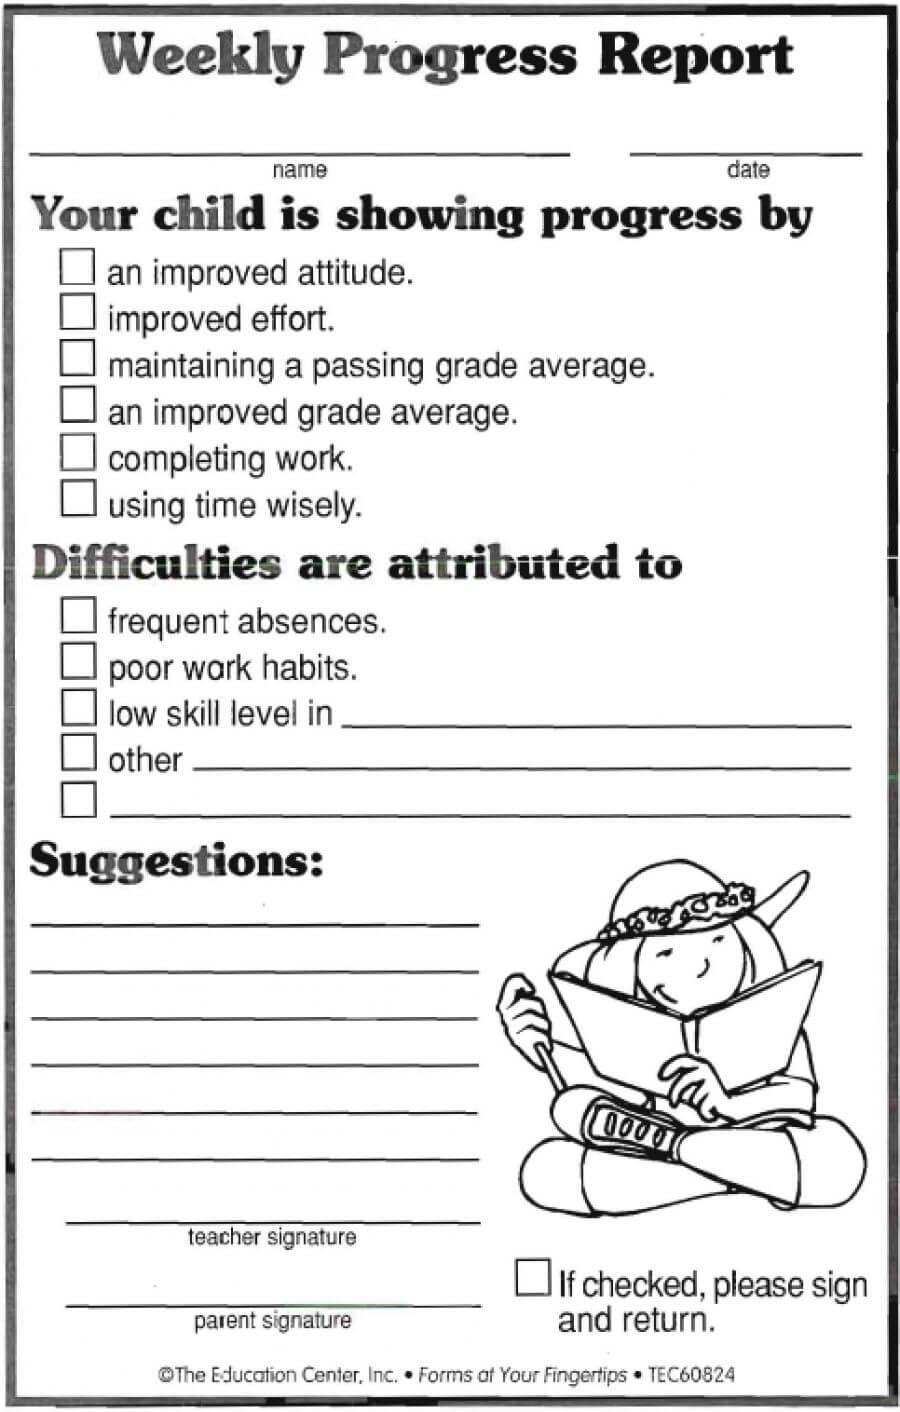 Weekly Progress Report | Ideas | Progress Report Template With Preschool Progress Report Template